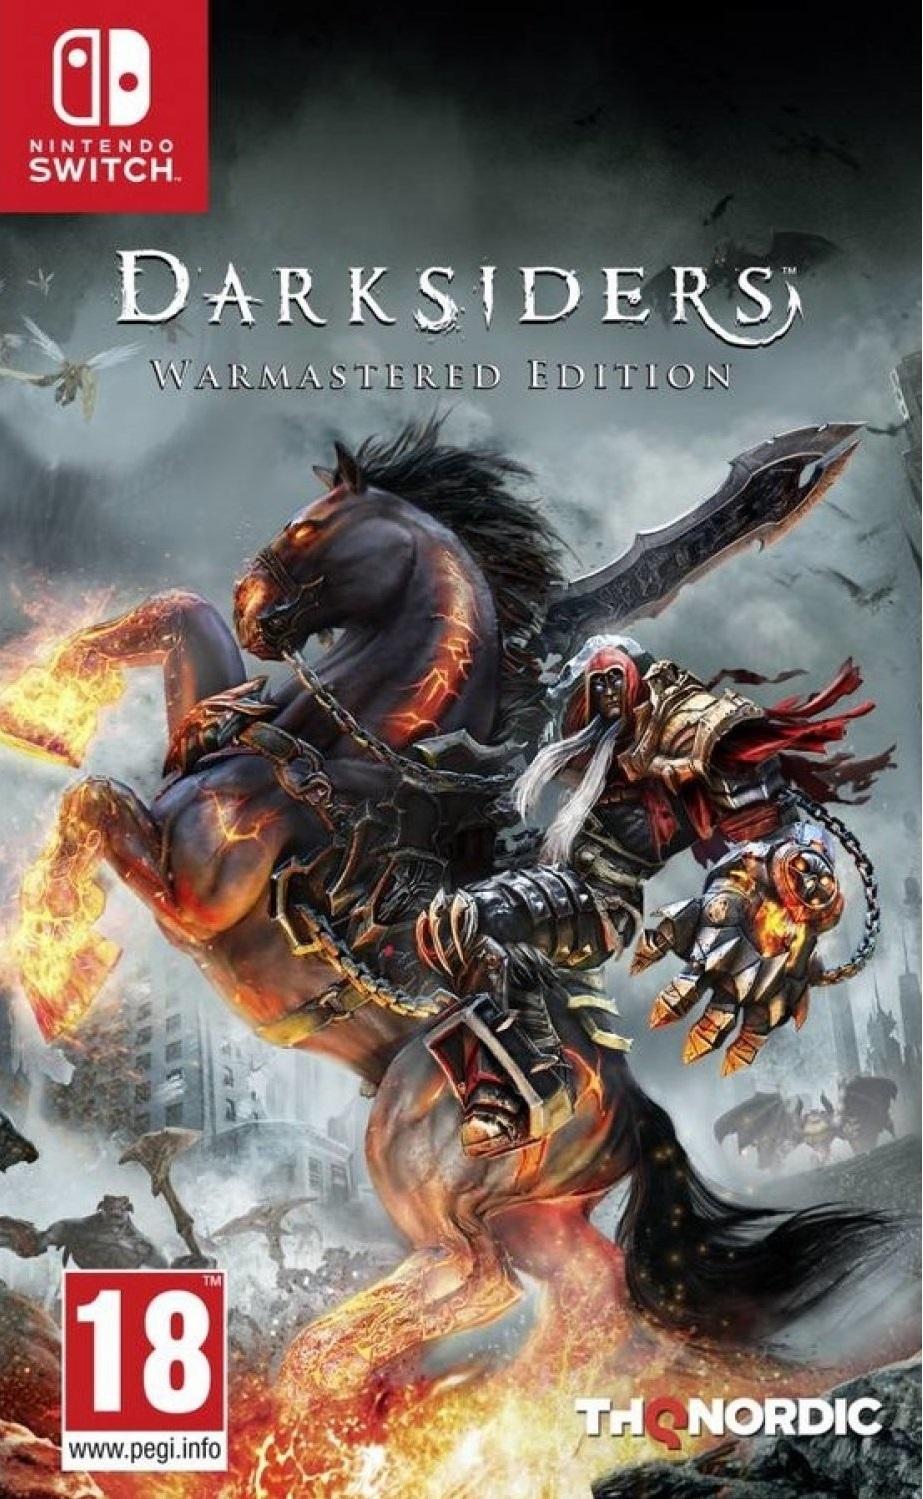 darksiders-warmastered-edition-586221.11.jpg